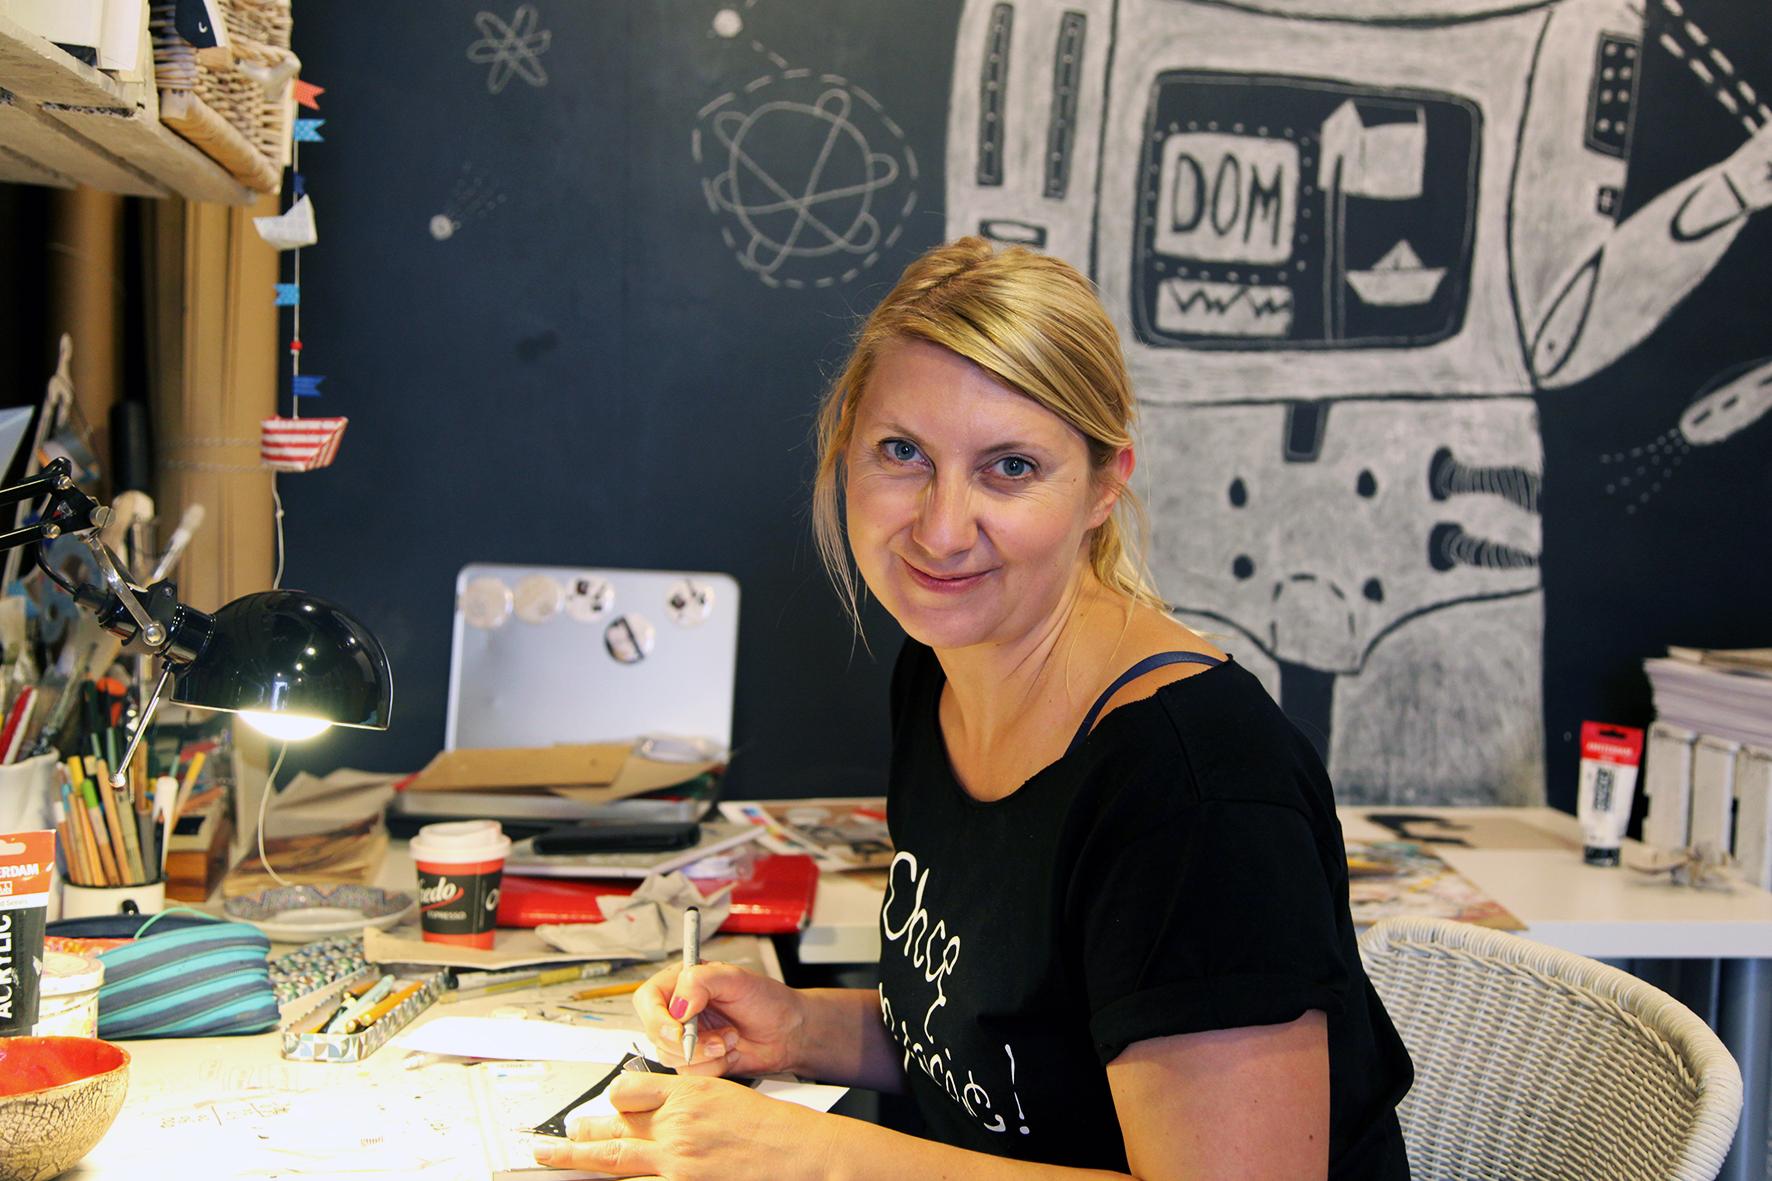 Amazing illustrator with a studio/gallery/shop called Lokarna on Josefa street in Krakow